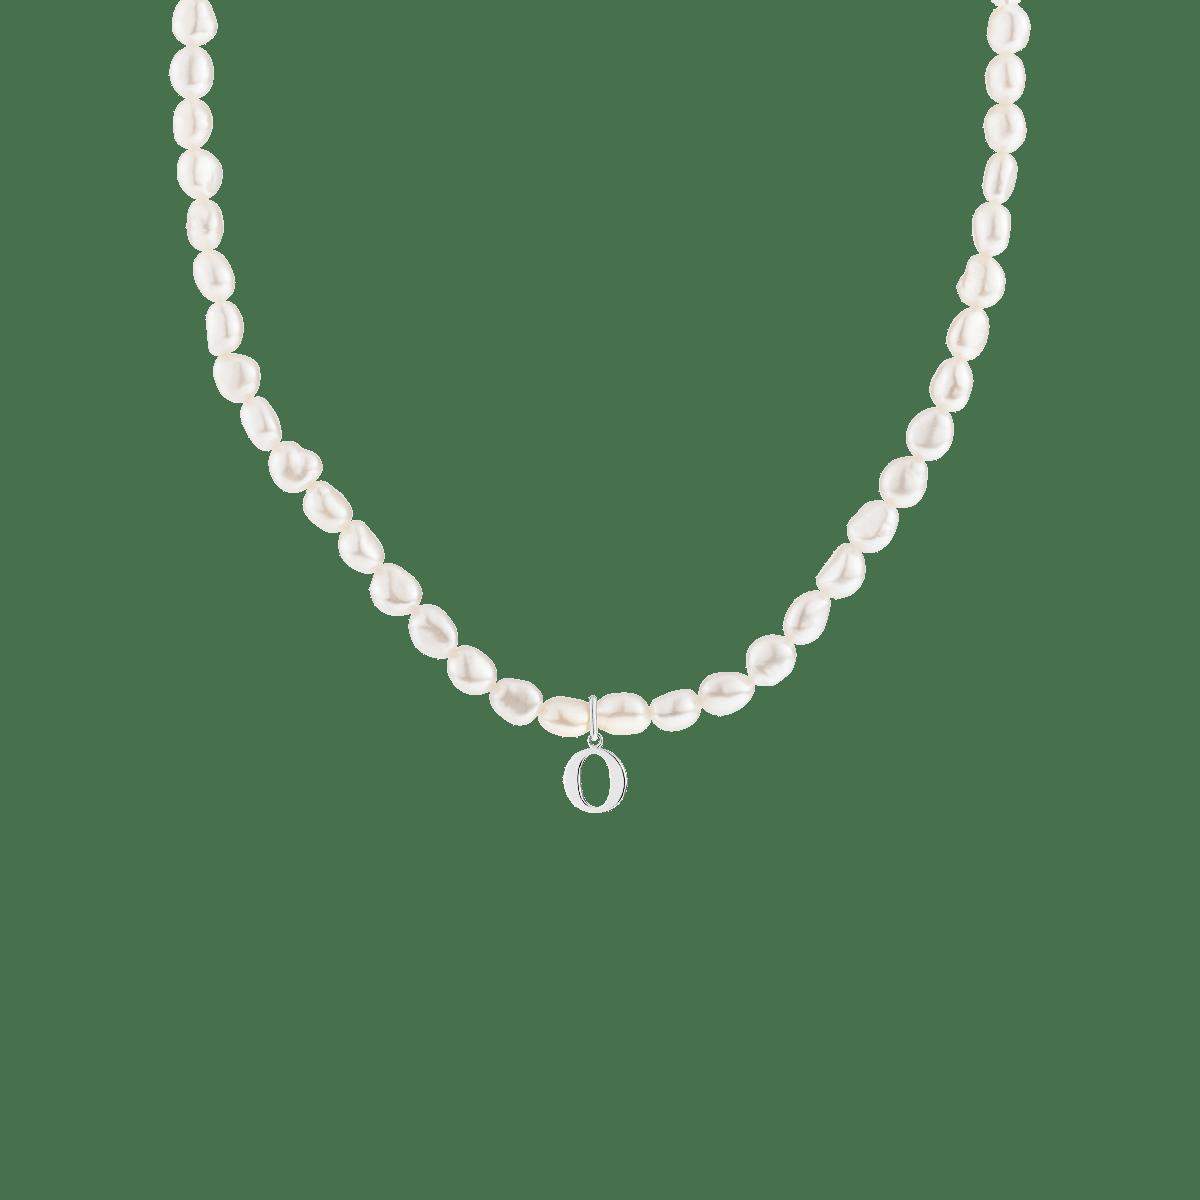 Grace Pearl Letter Necklace